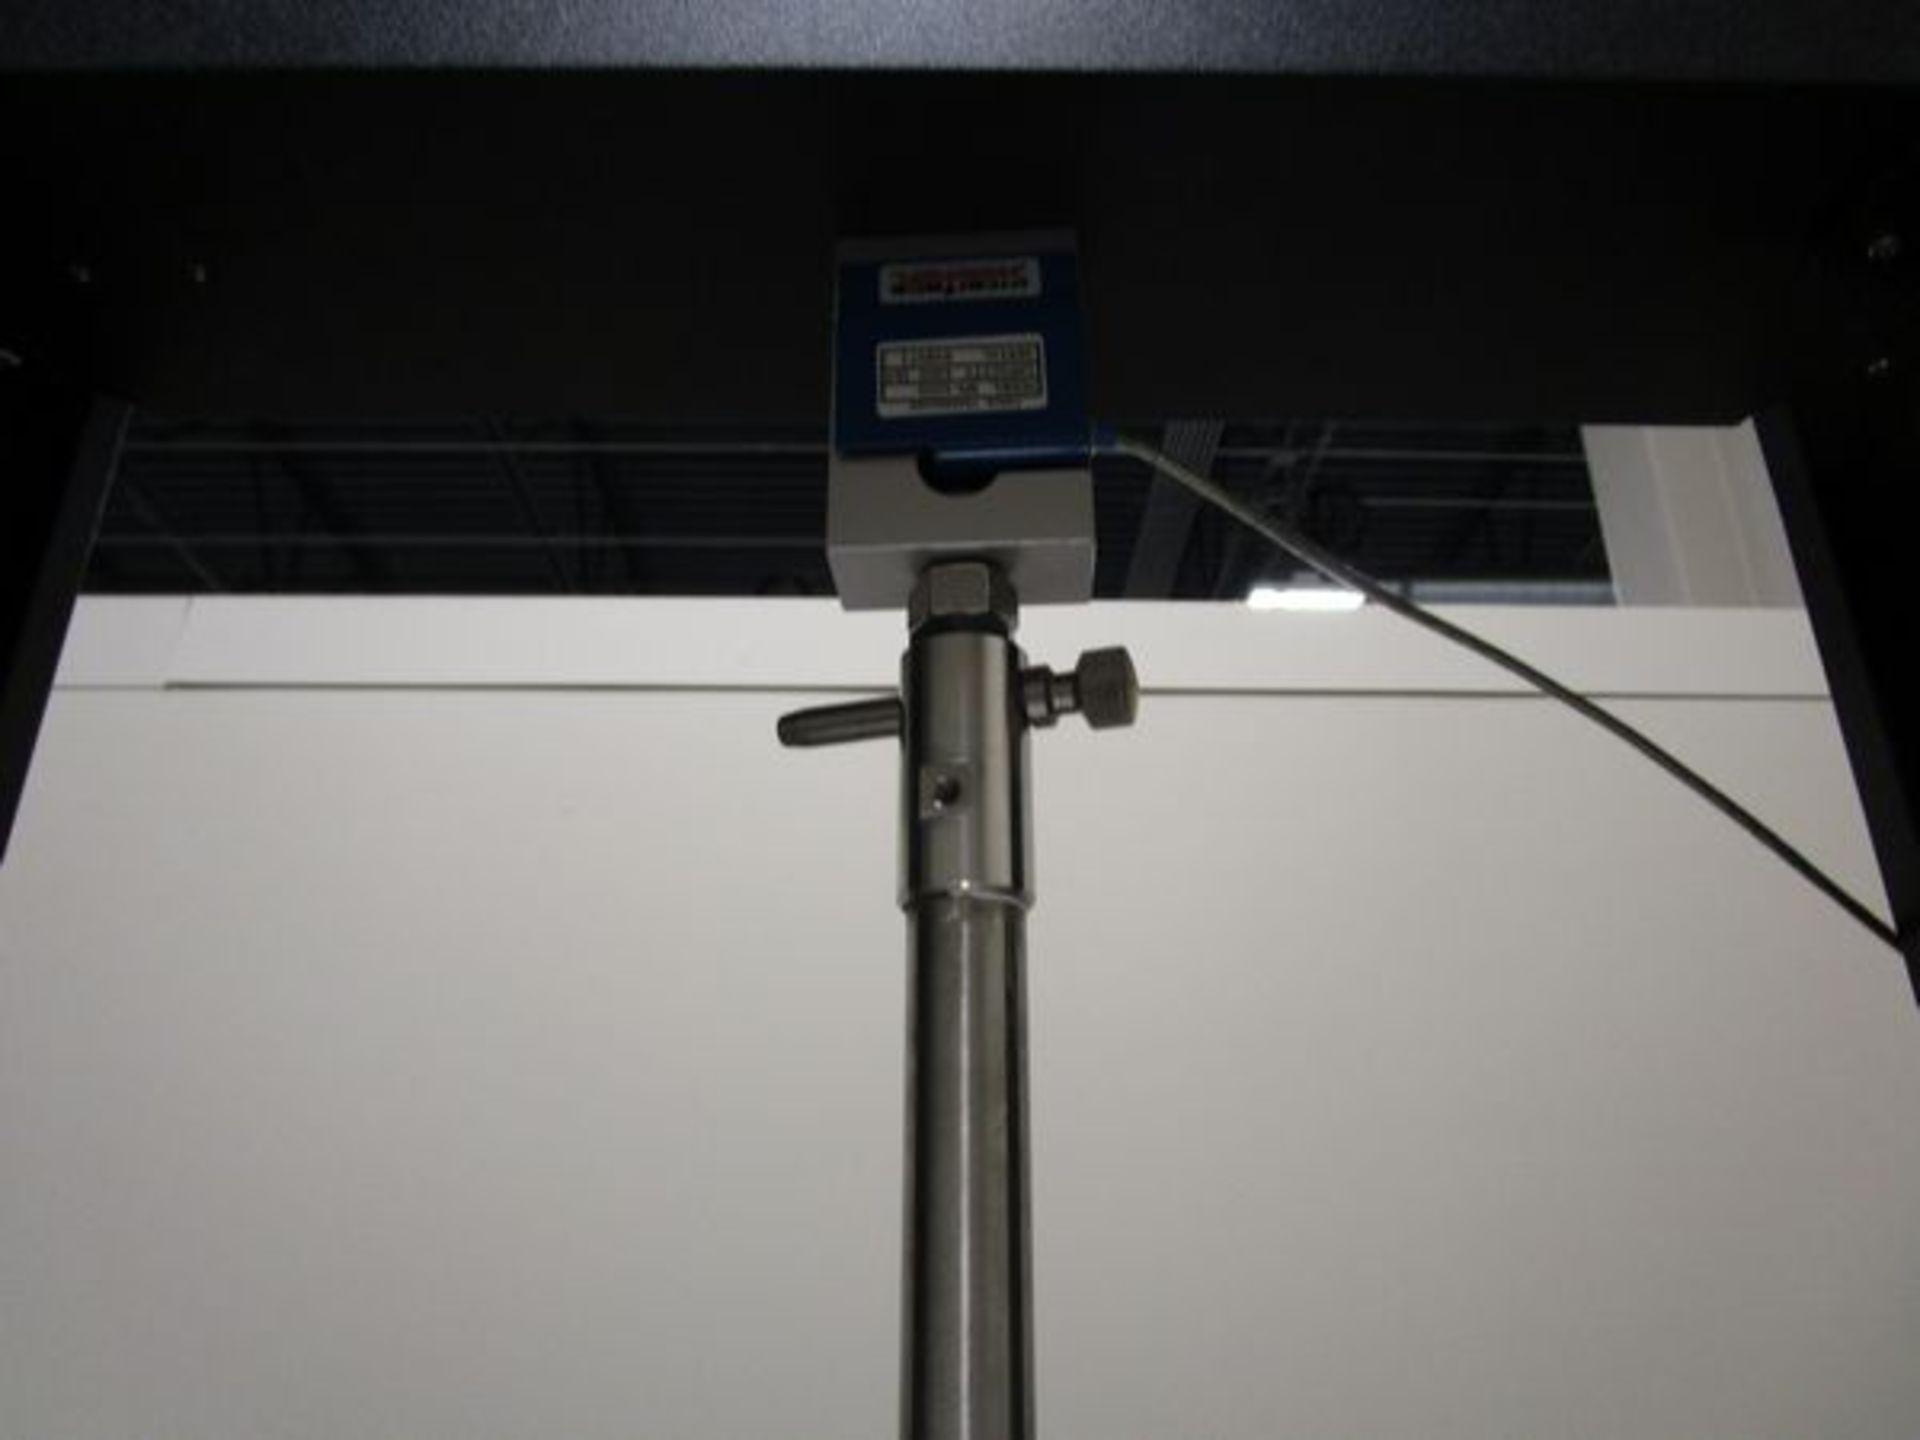 Admet Expert 2610-5KN Tensile Tester s/n 2610-1002021, Power Supply, PC & Table - Image 5 of 9